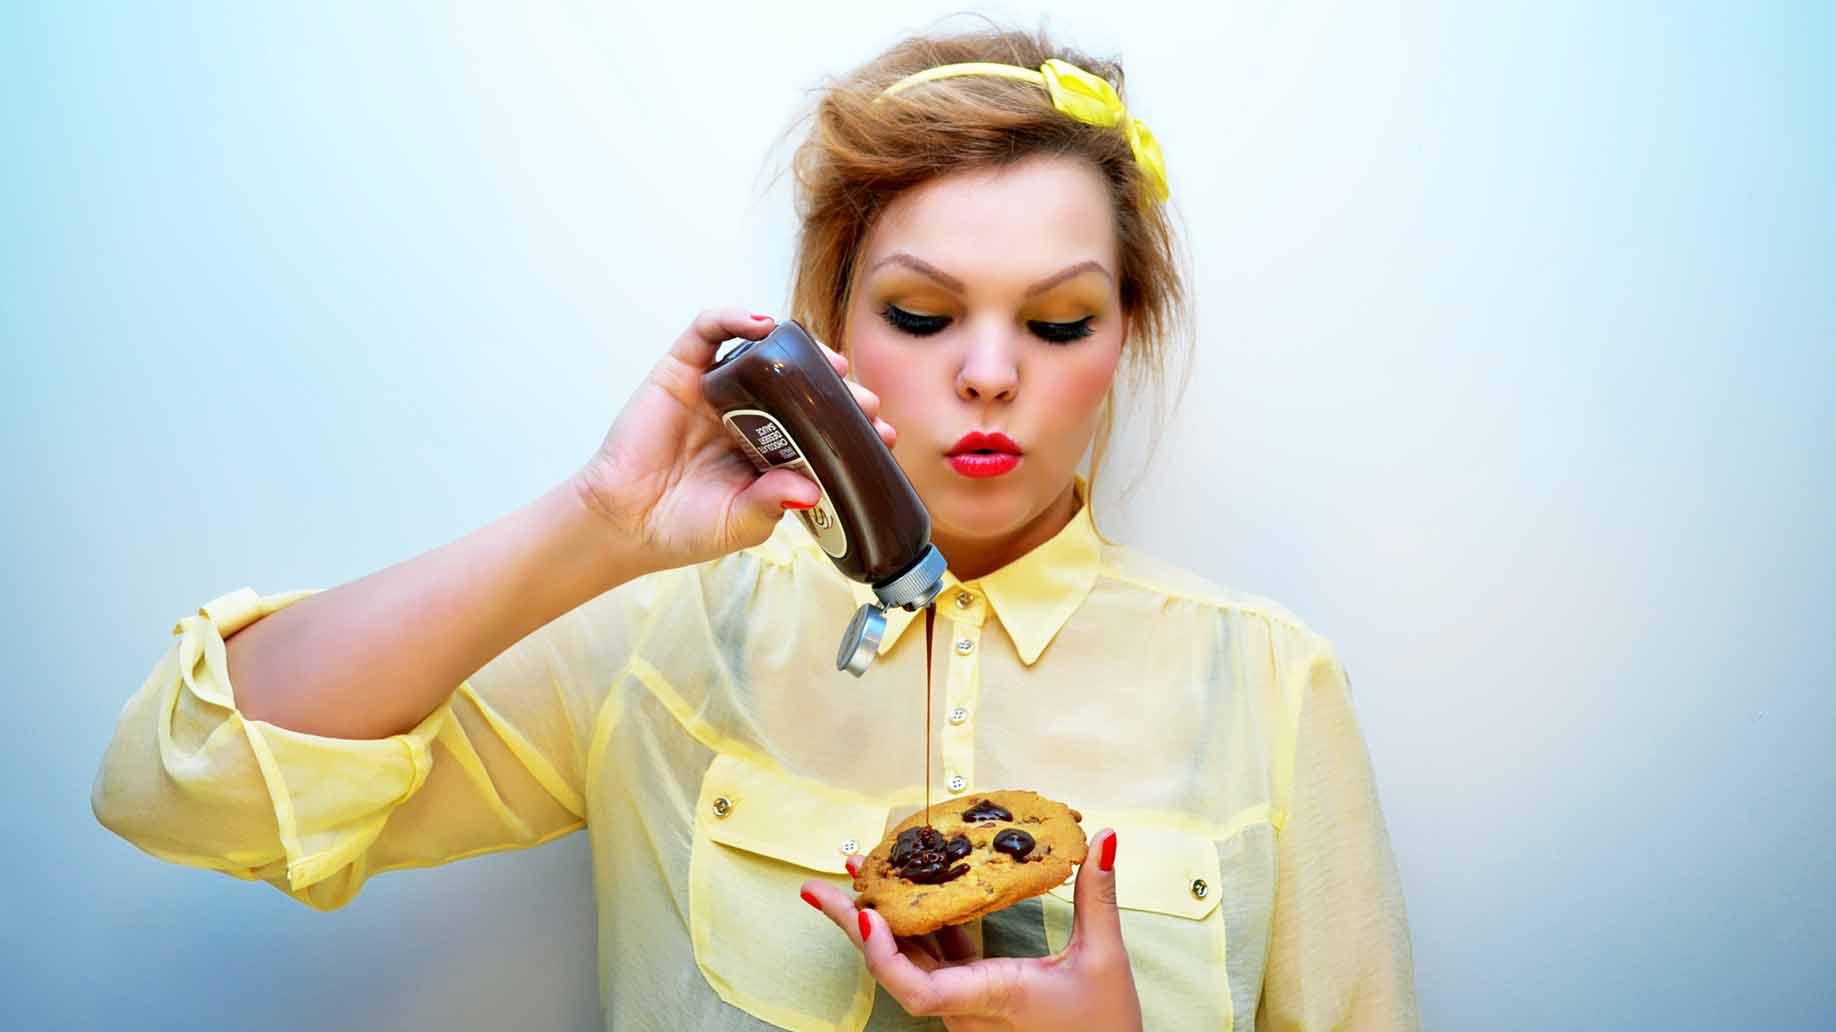 cravings hormone imbalance pms periods menses menopause natural remedies balance